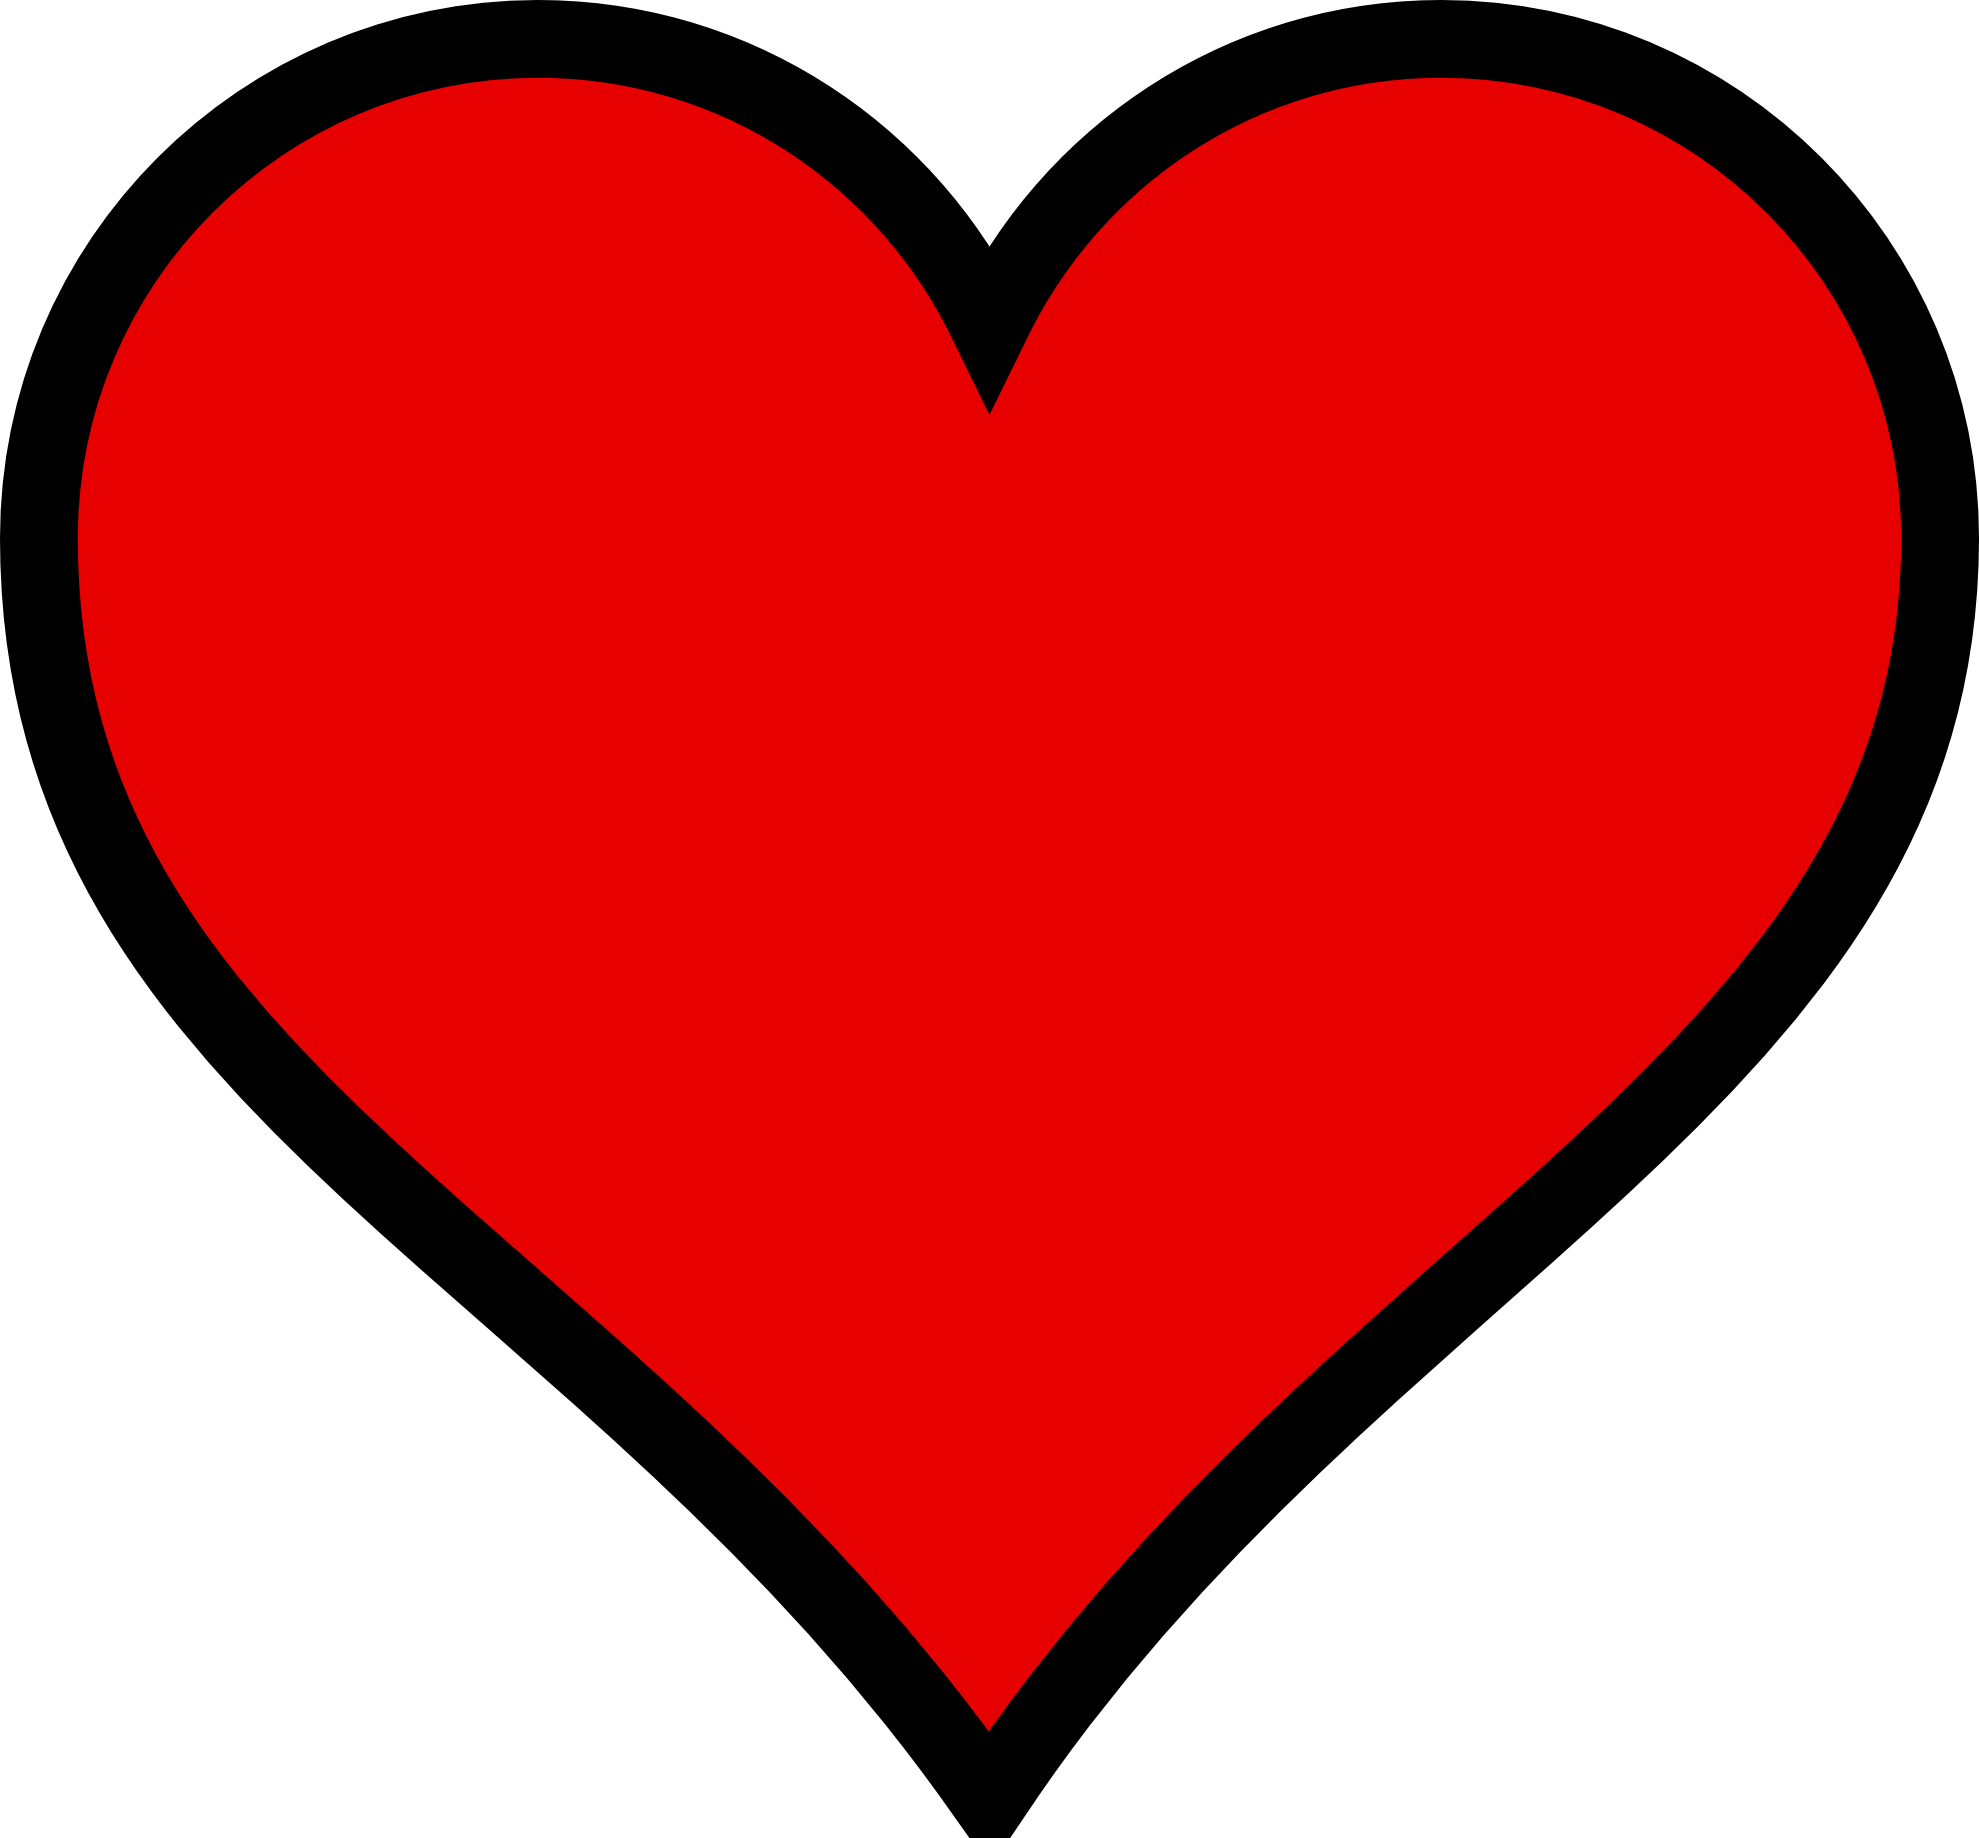 Valentine Heart Outline - ClipArt Best